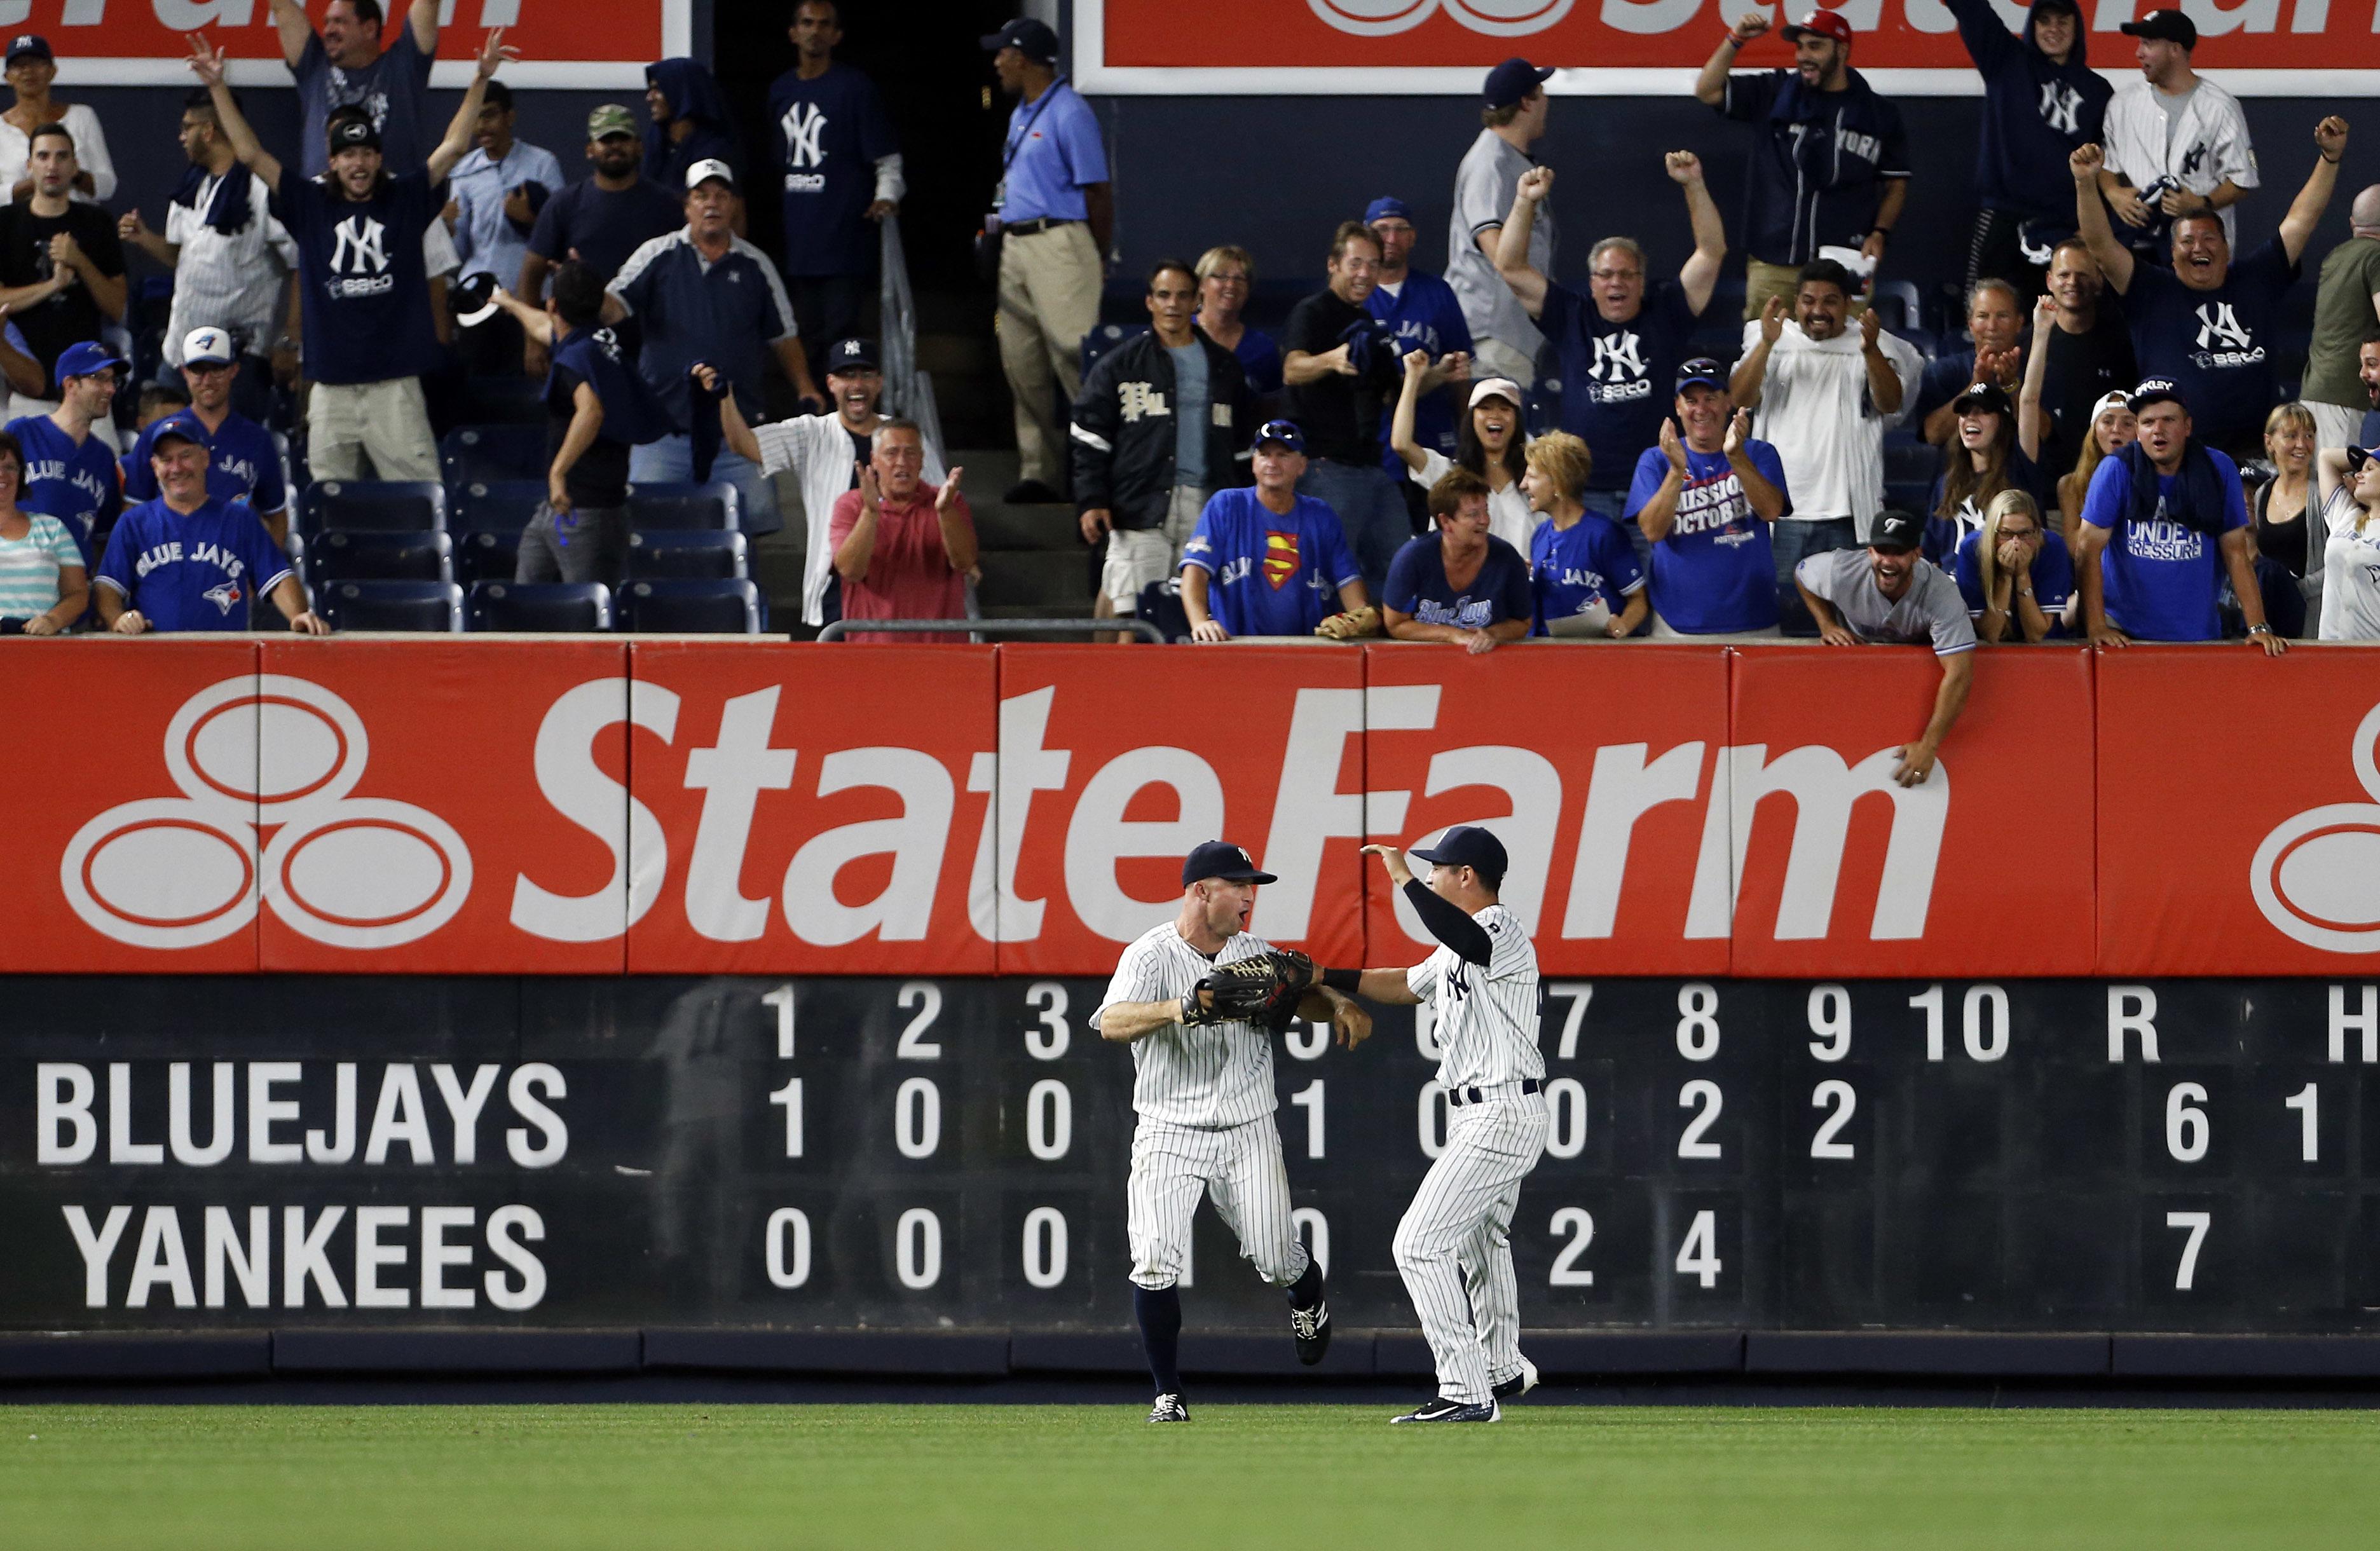 New York Yankees left fielder Brett Gardner, left, celebrates making the game-ending catch with center fielder Jacoby Ellsbury during the ninth inning of a baseball game against the Toronto Blue Jays on Tuesday, Sept. 6, 2016, in New York. The Yankees won